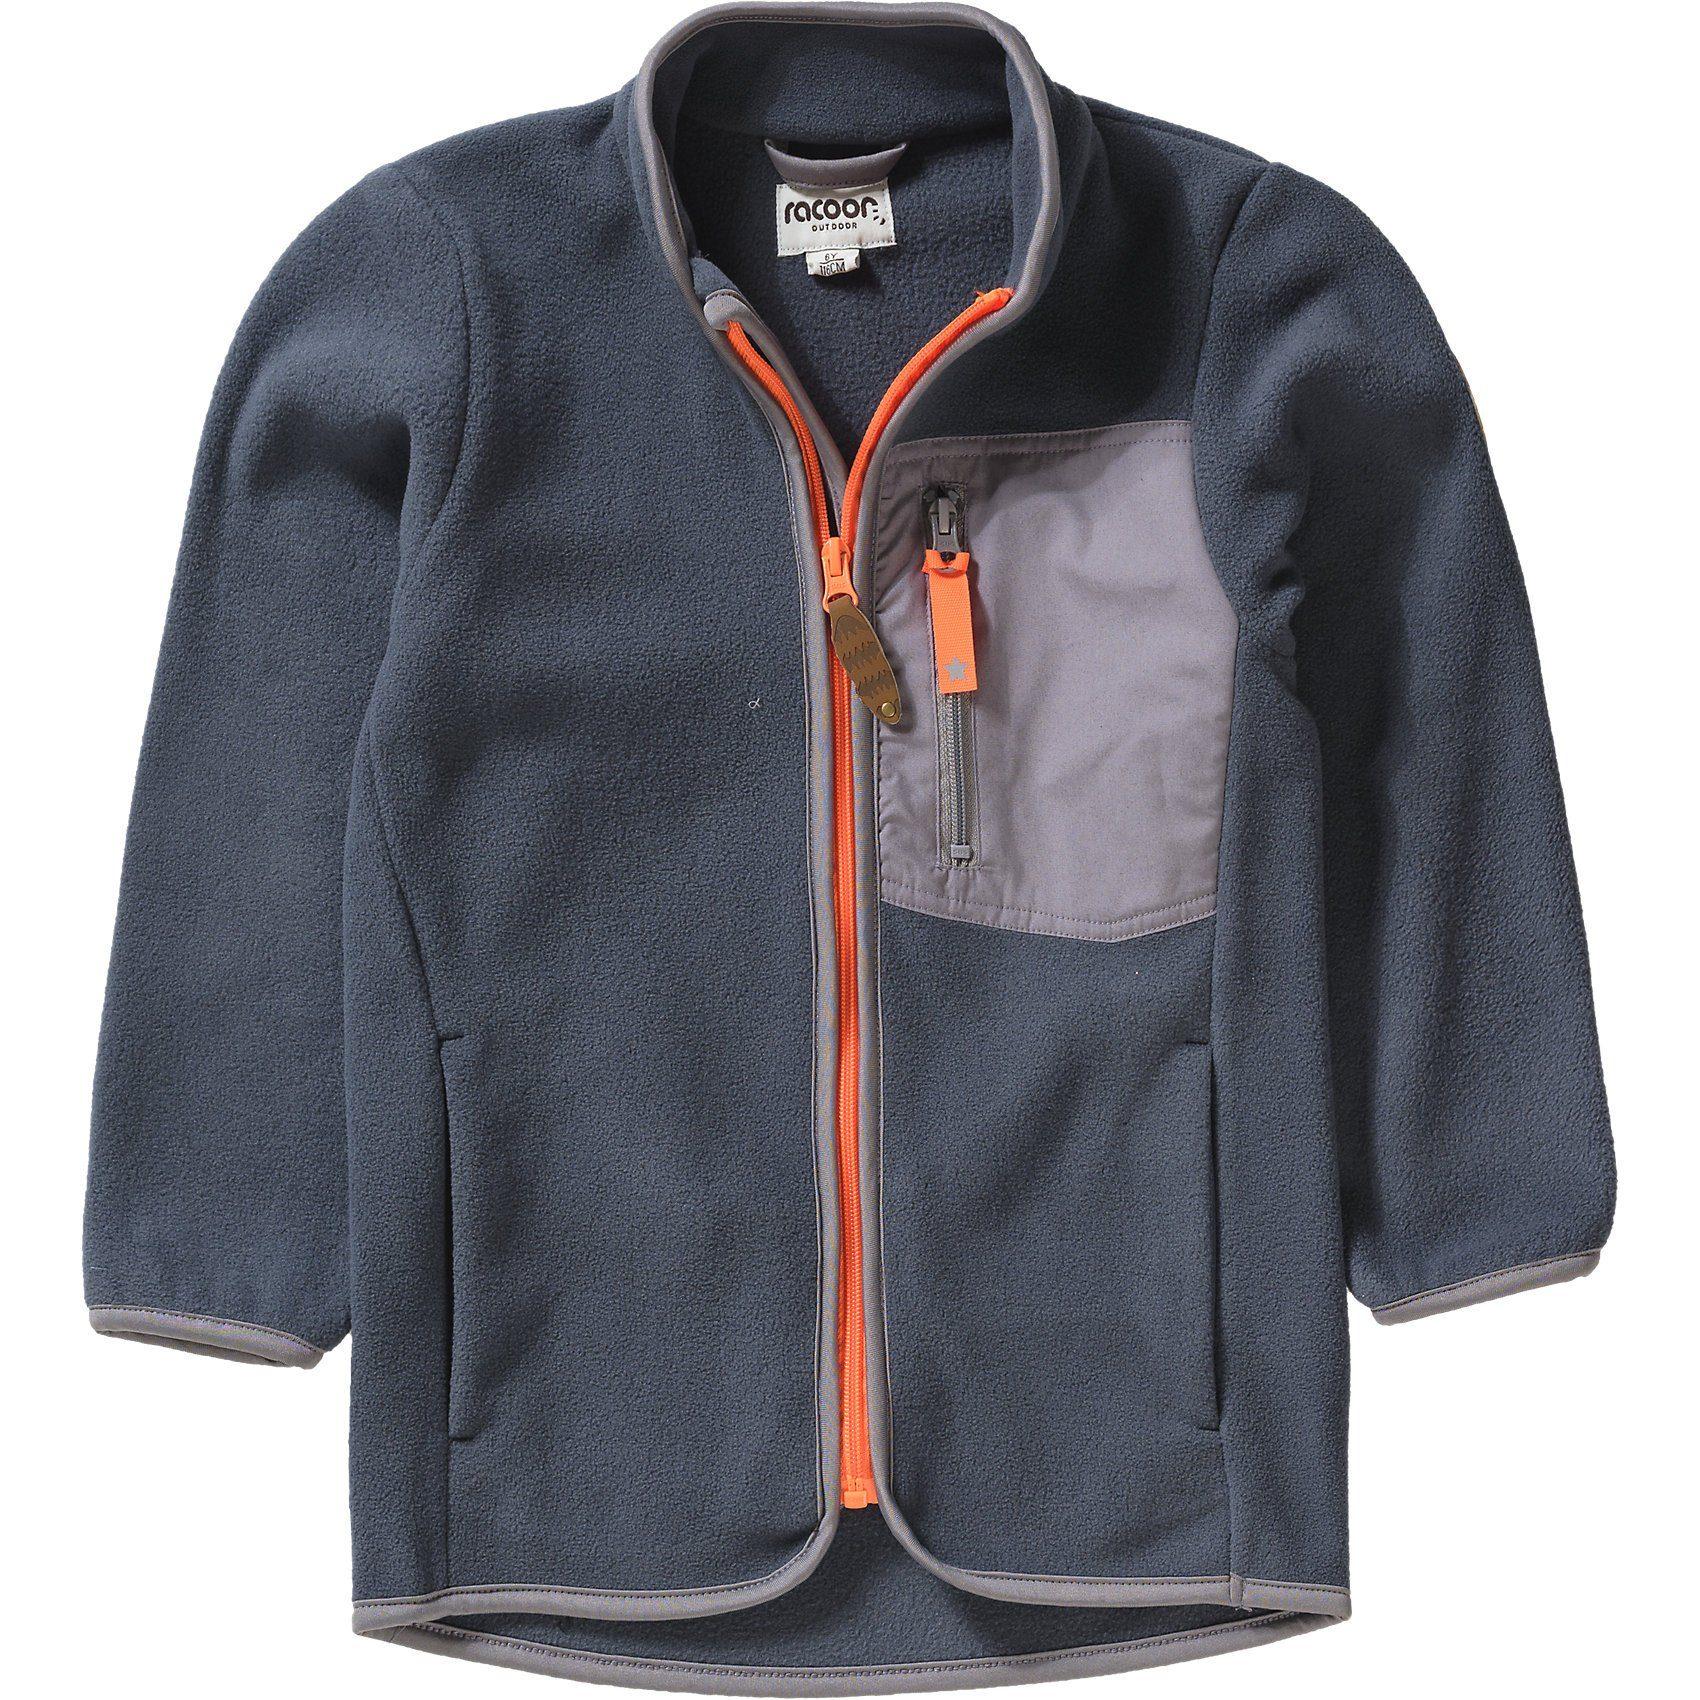 Aprico Damen Langarm Longsleeve Shirt Viskose Grau Traumfänger lange Ärmel